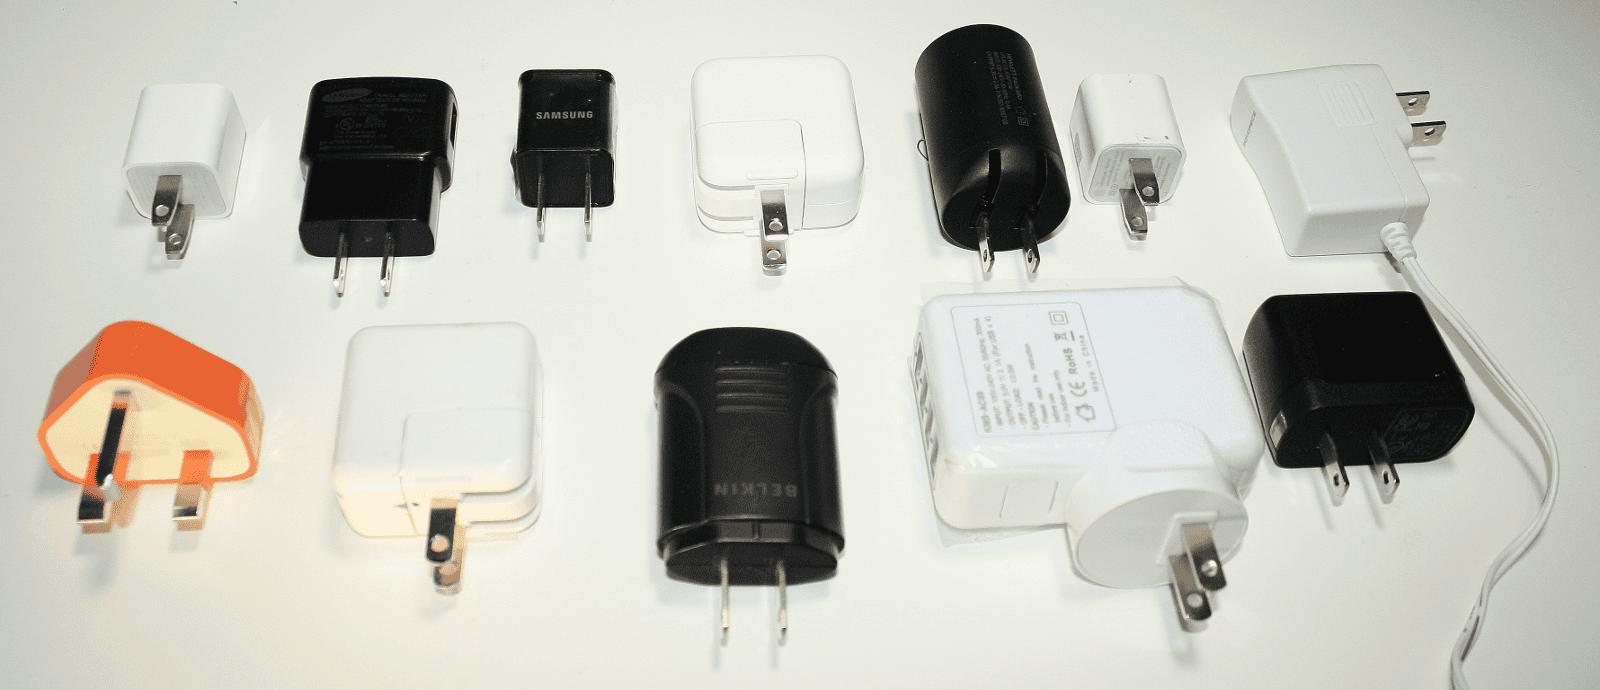 EU standardizing chargers